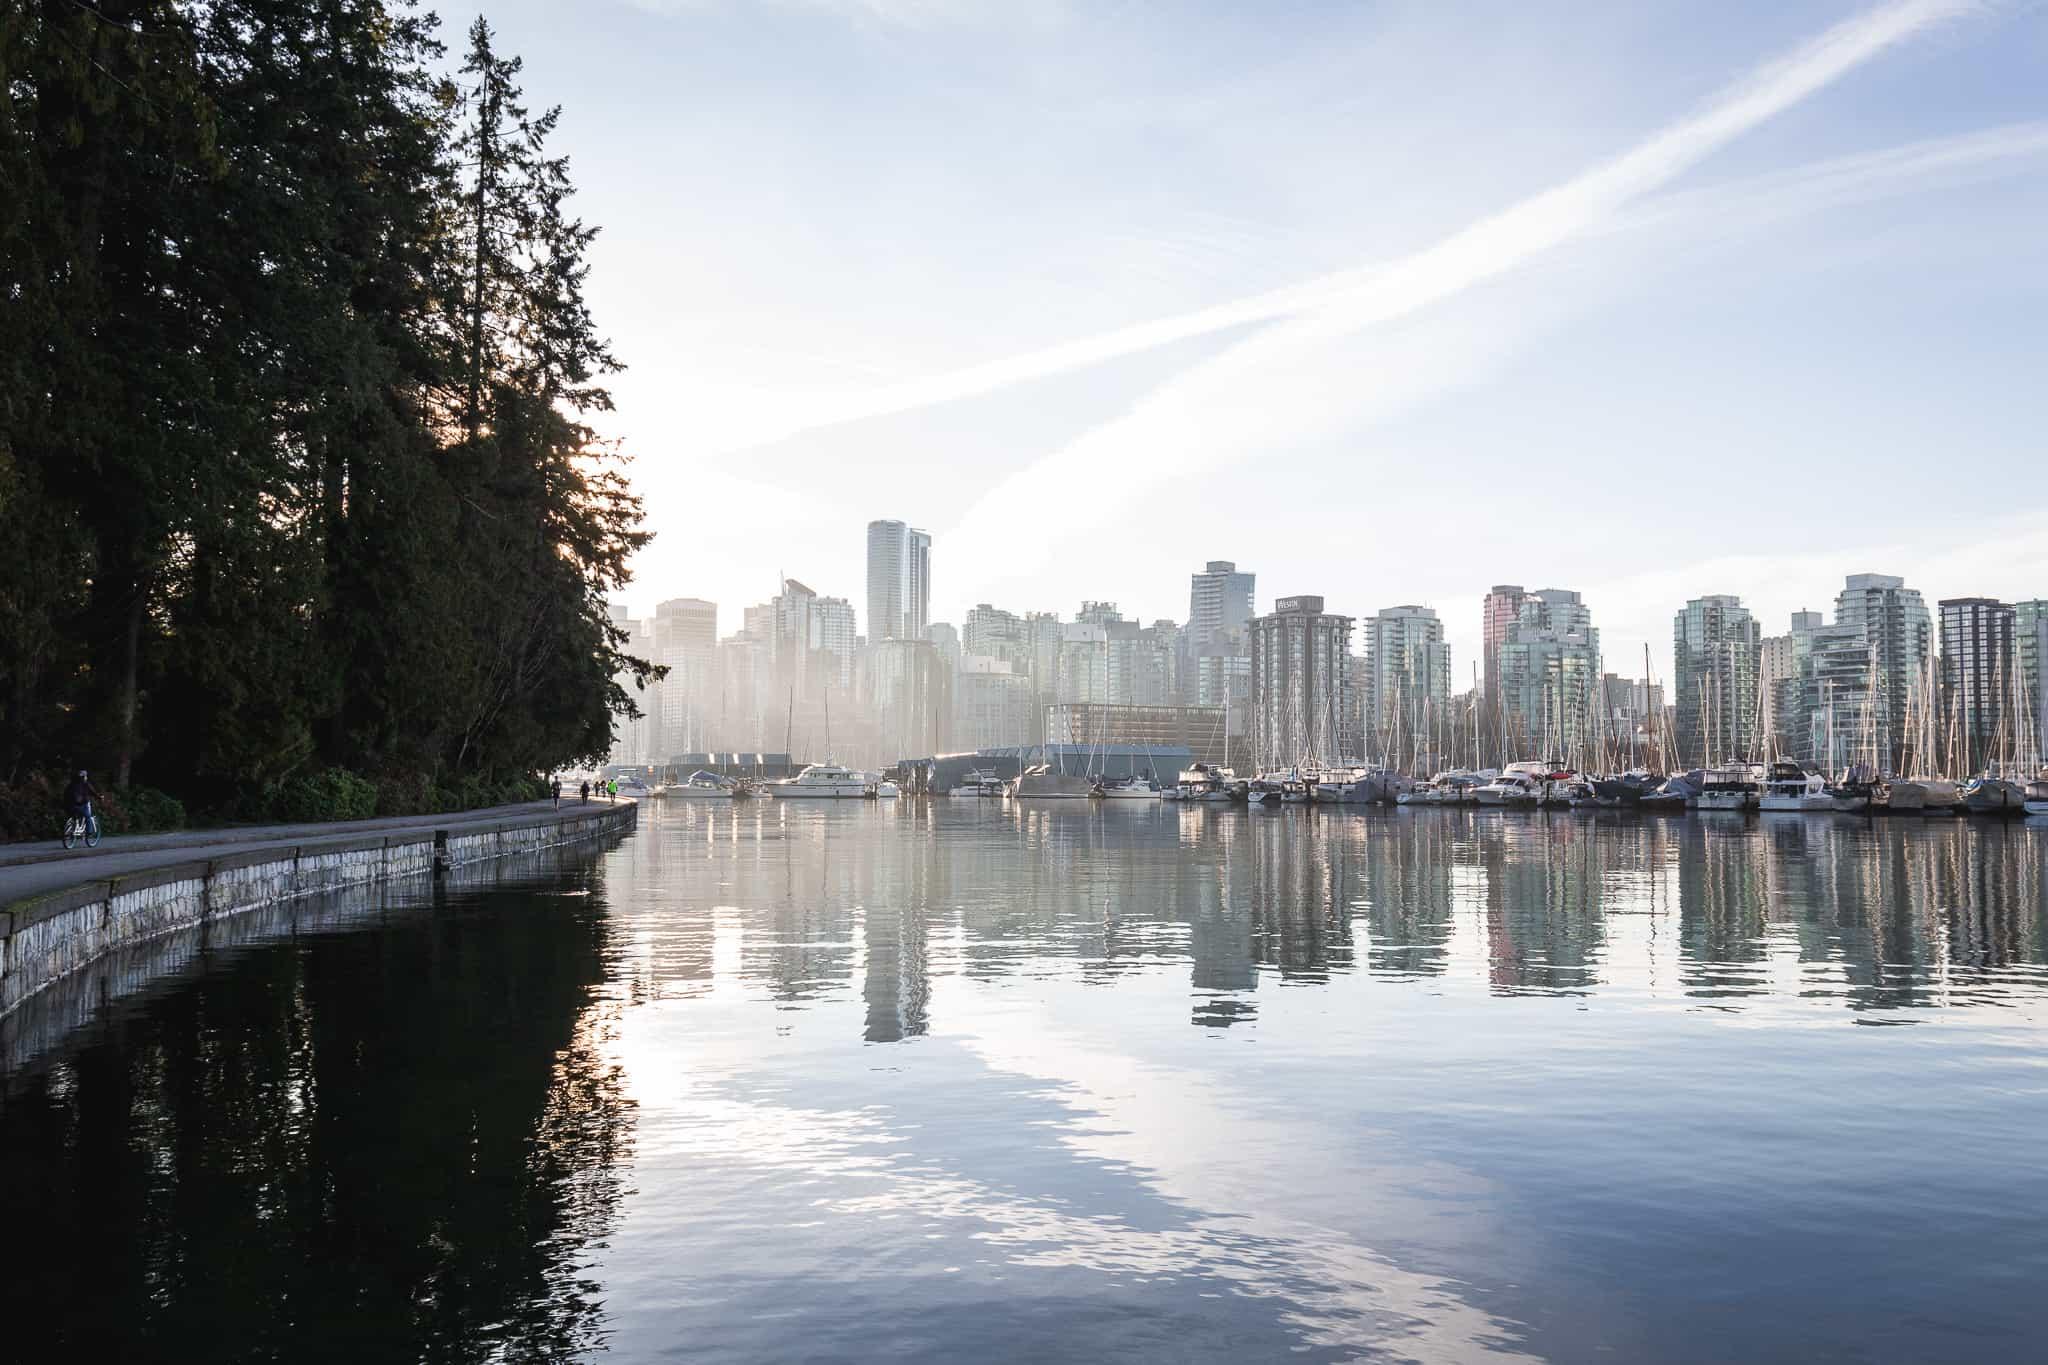 Instagrammable spots Vancouver - Seawall